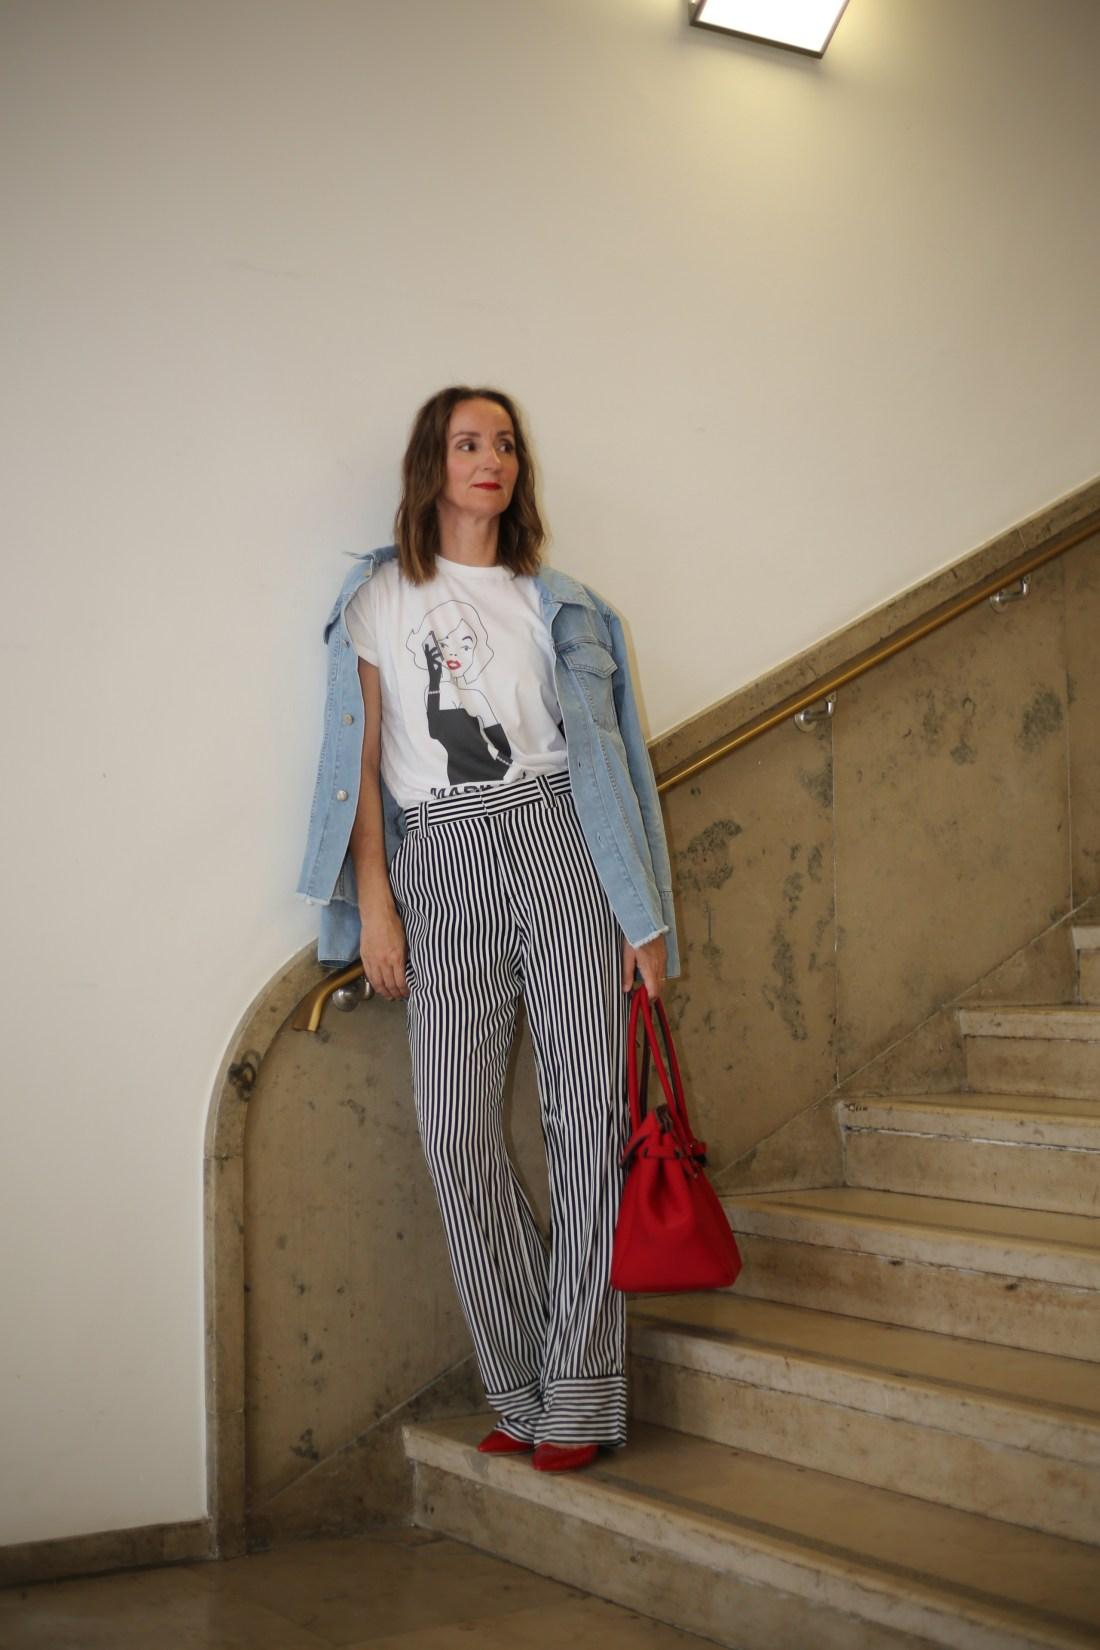 weite-pyjama-hose_streifen_faltenrock_streifenbluse_slingback-pumps_rot_mode-blog-ü40_Oceanblue-style_jeansjacke_denim_neopren_birkin-bag (2)